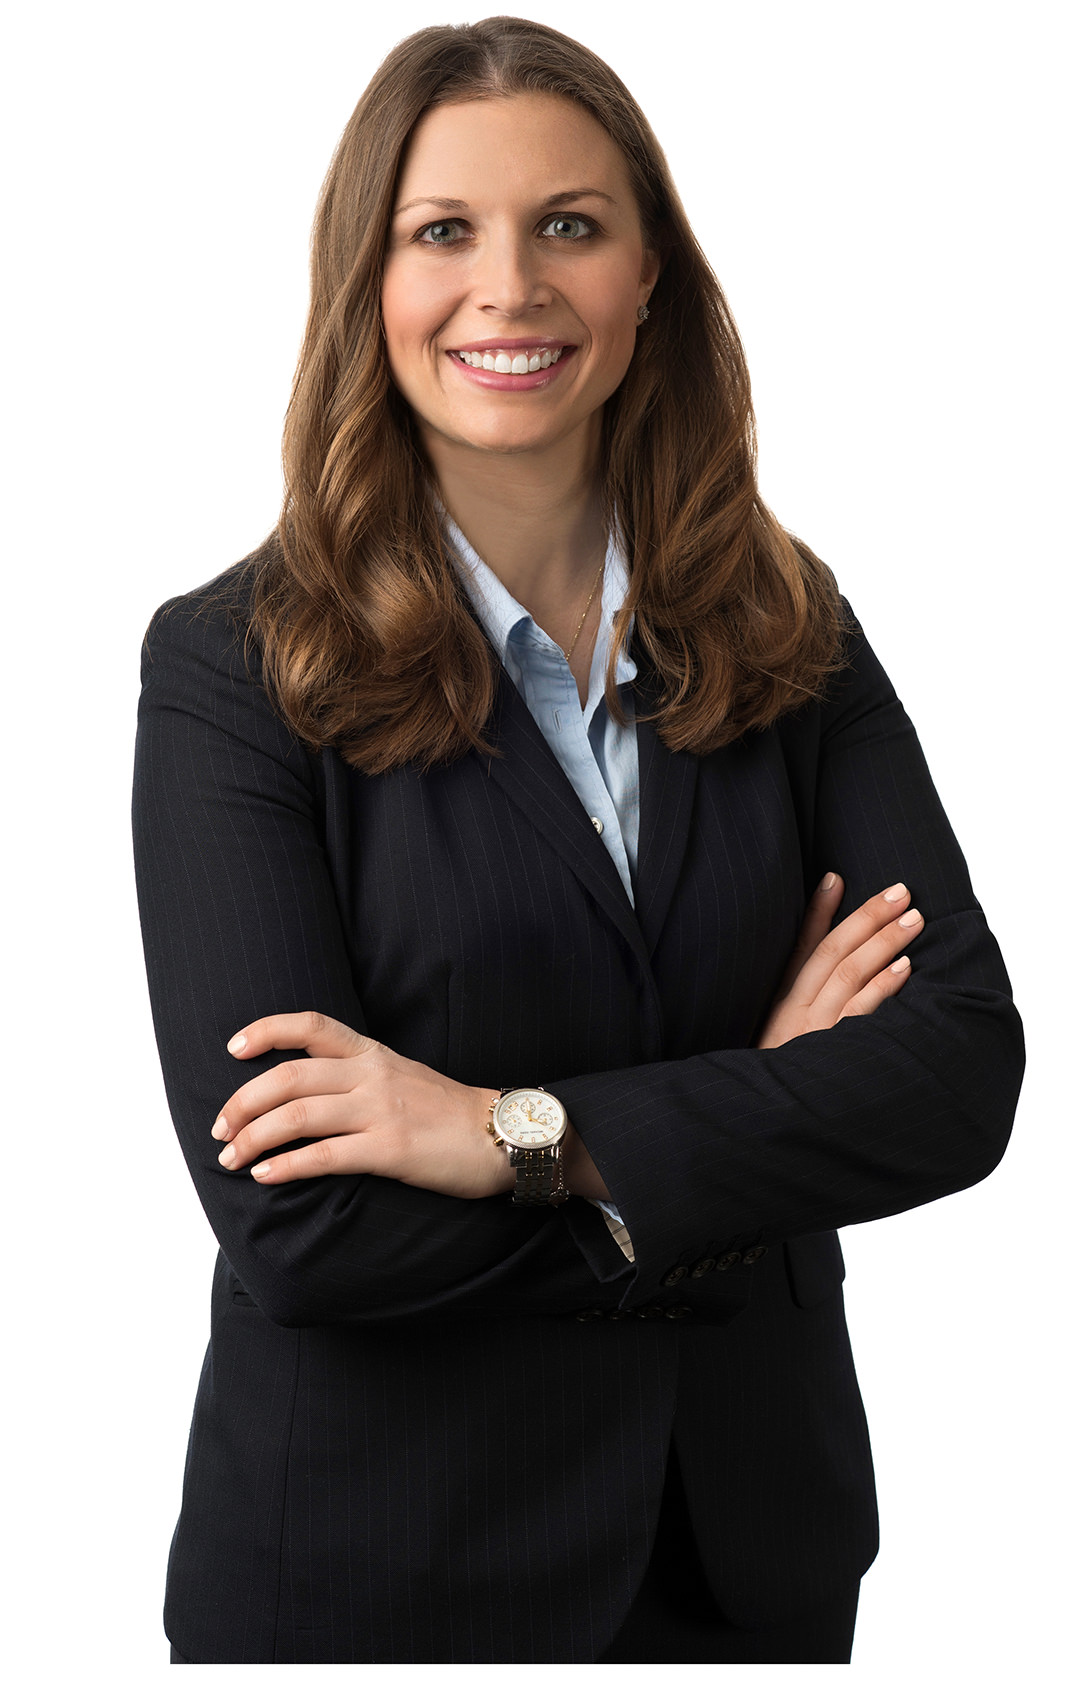 Katherine A. DeStefano